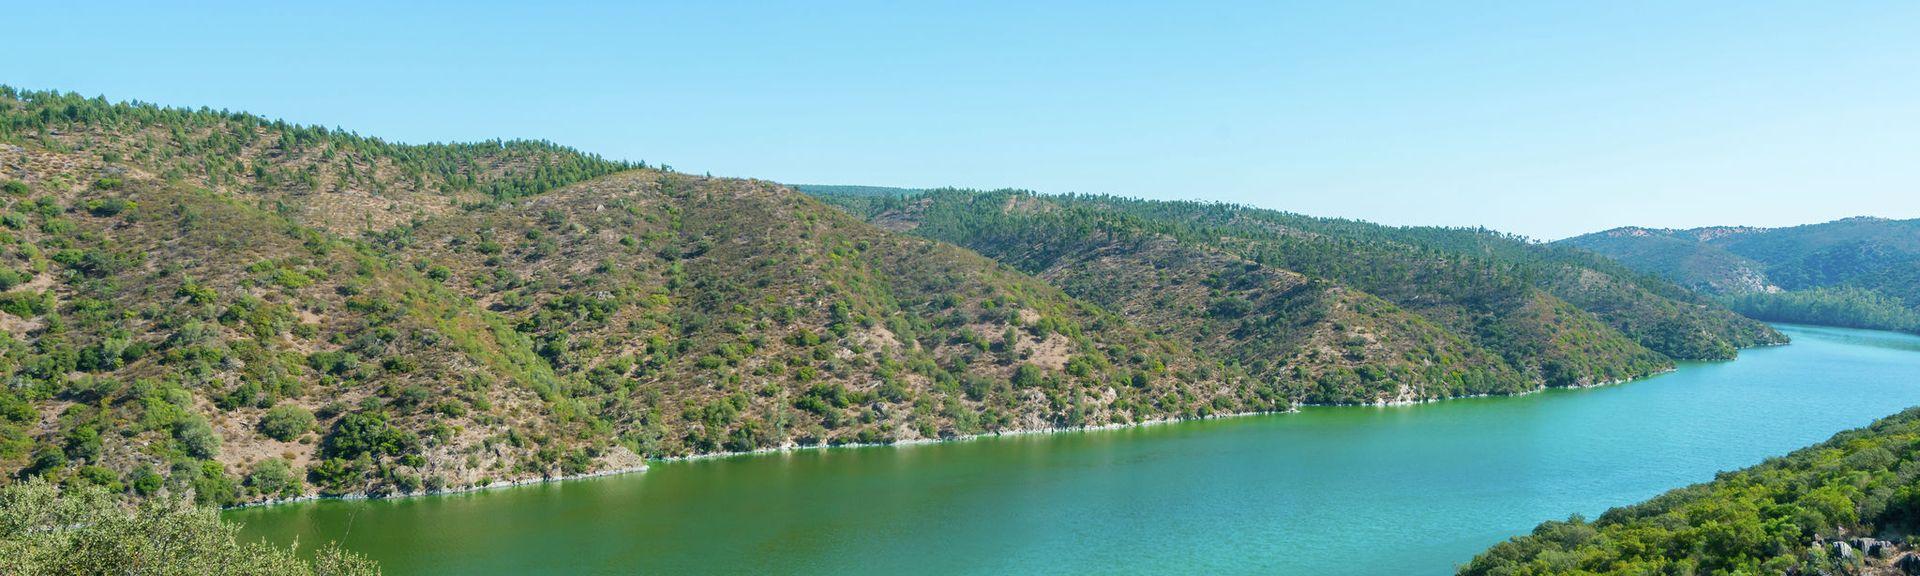 Cáceres (provincie), Extremadura, Spanje